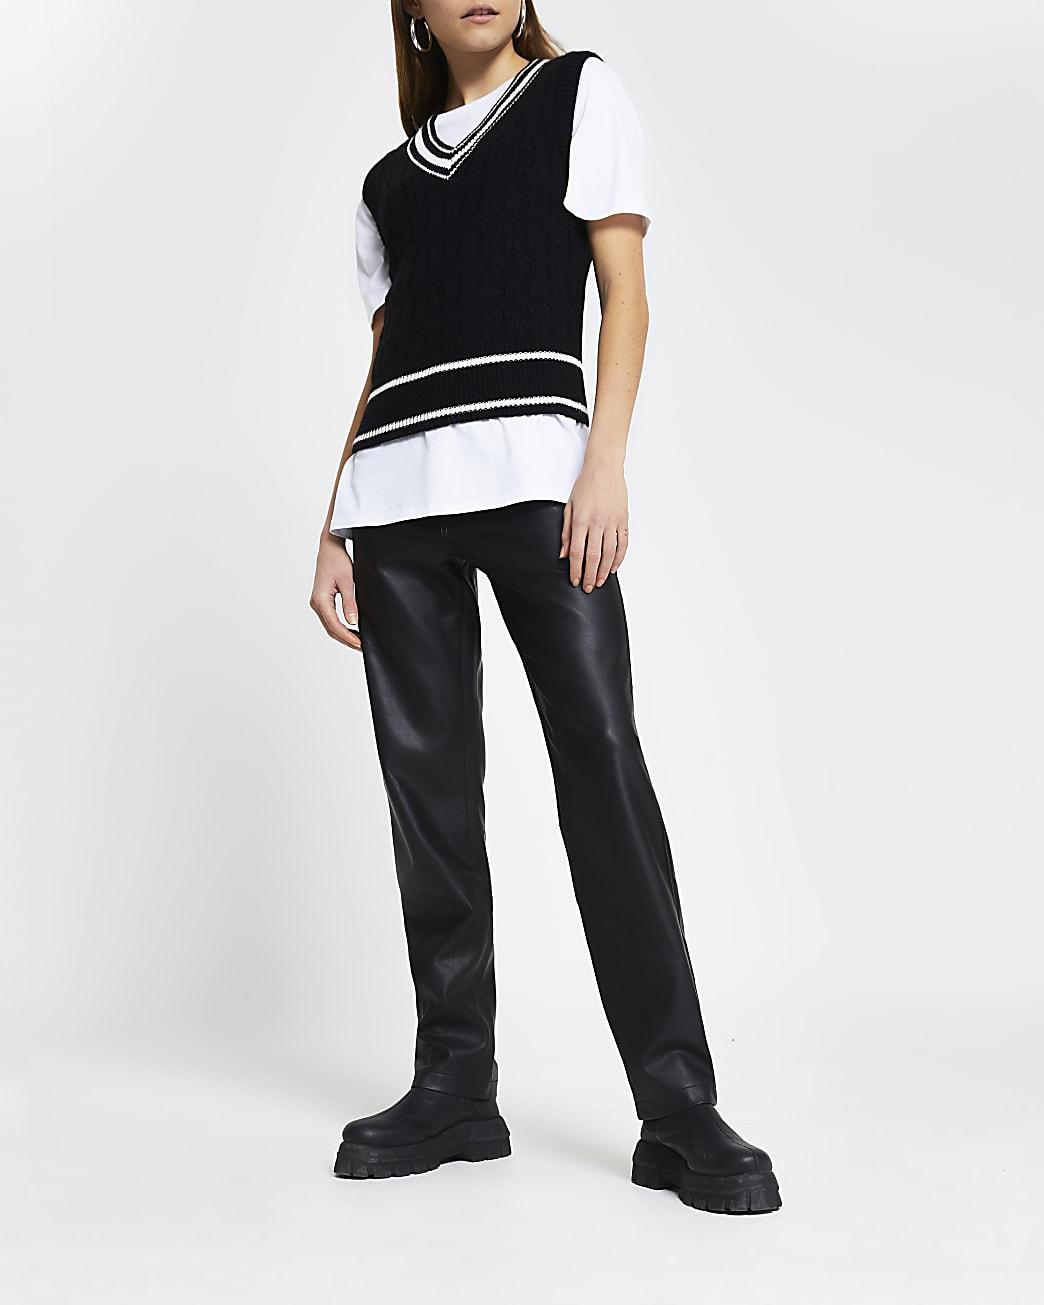 Black cable knit sleeveless cardigan